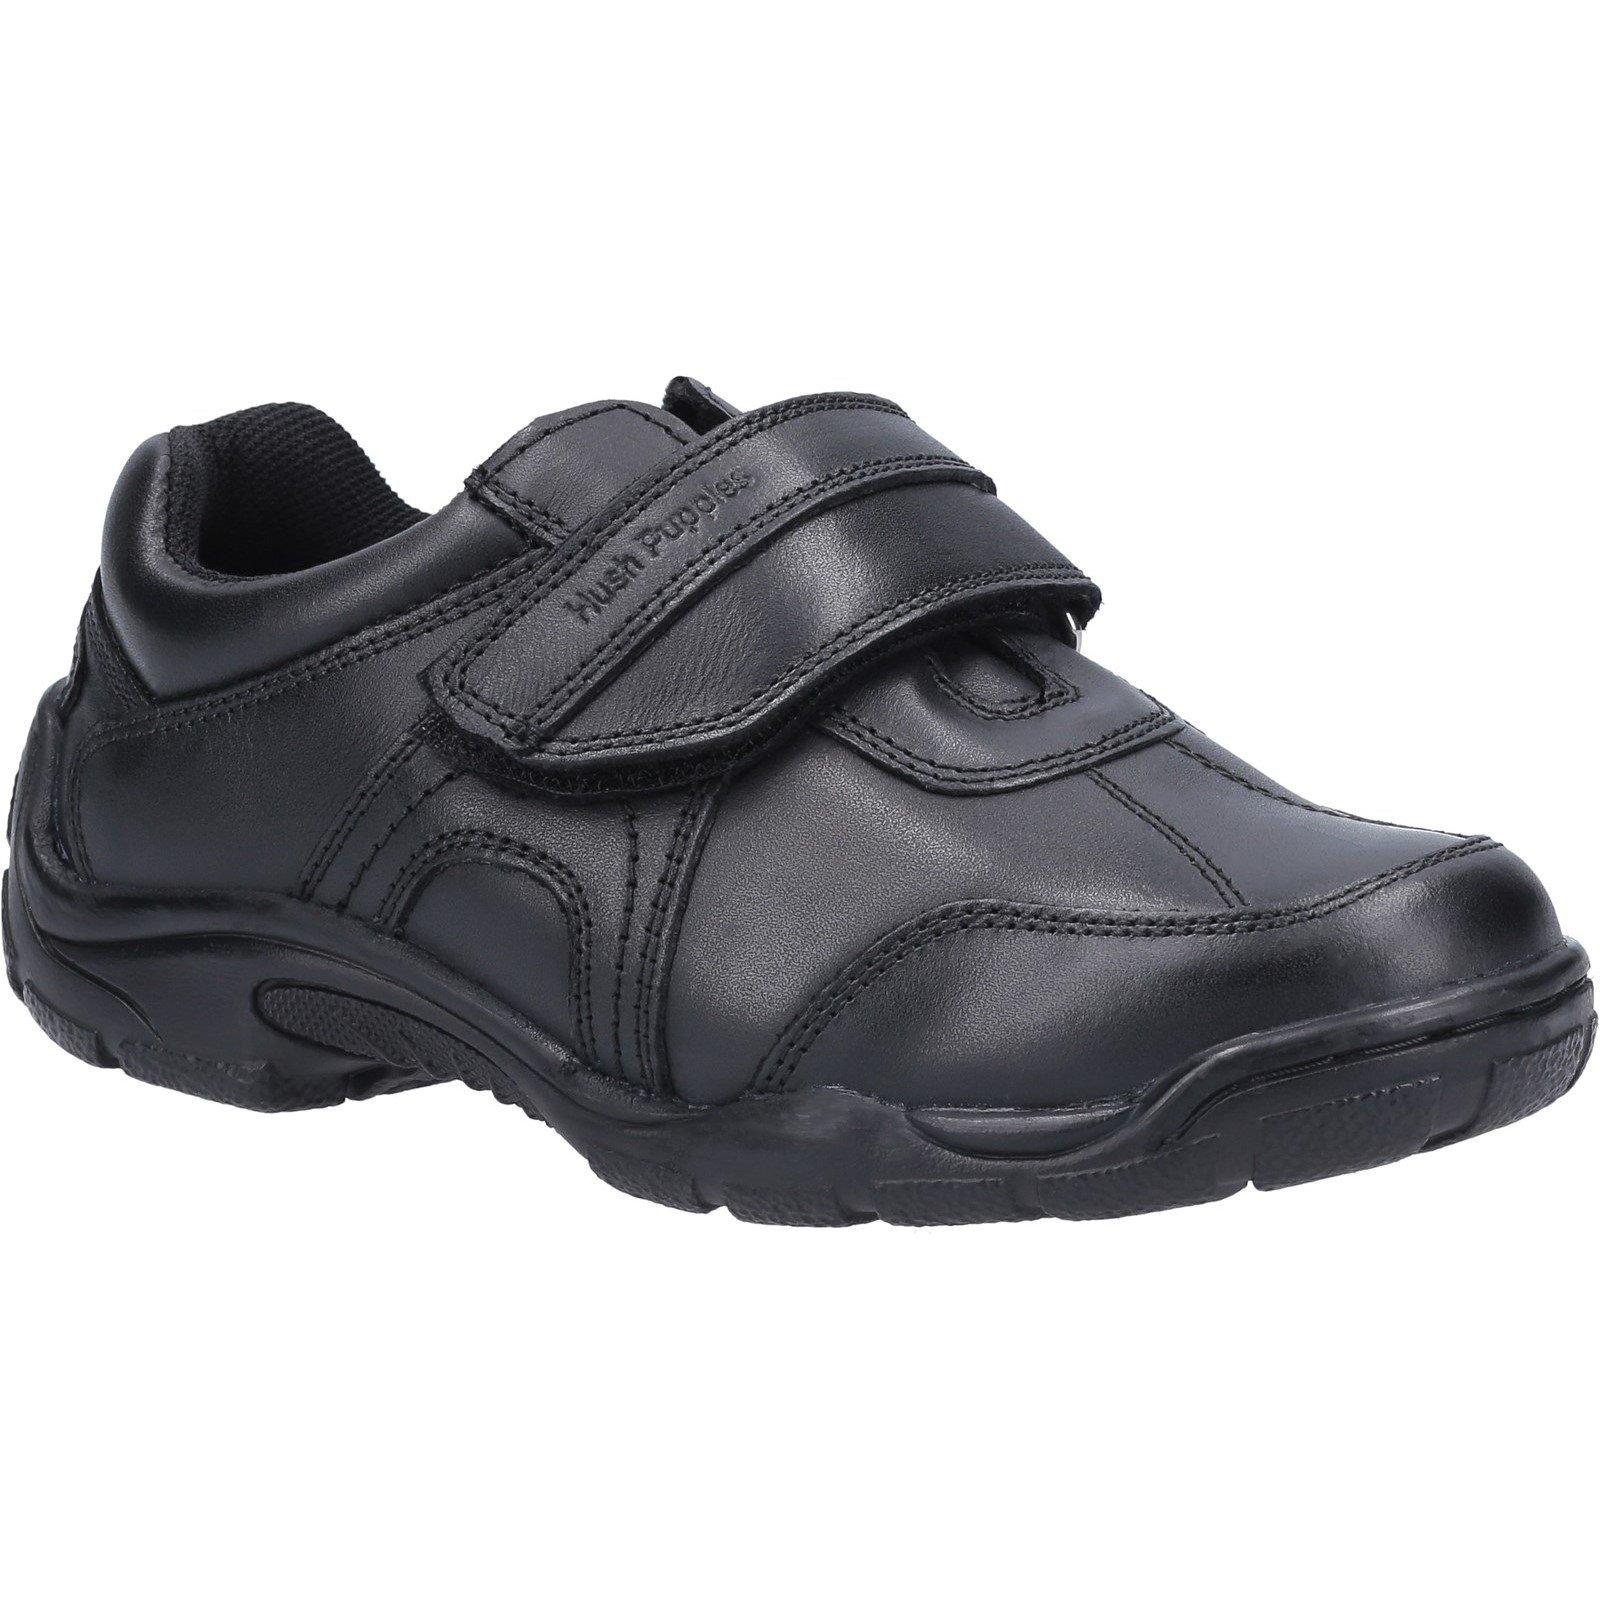 Hush Puppies Kid's Arlo Junior School Shoe Black 30853 - Black 1.5